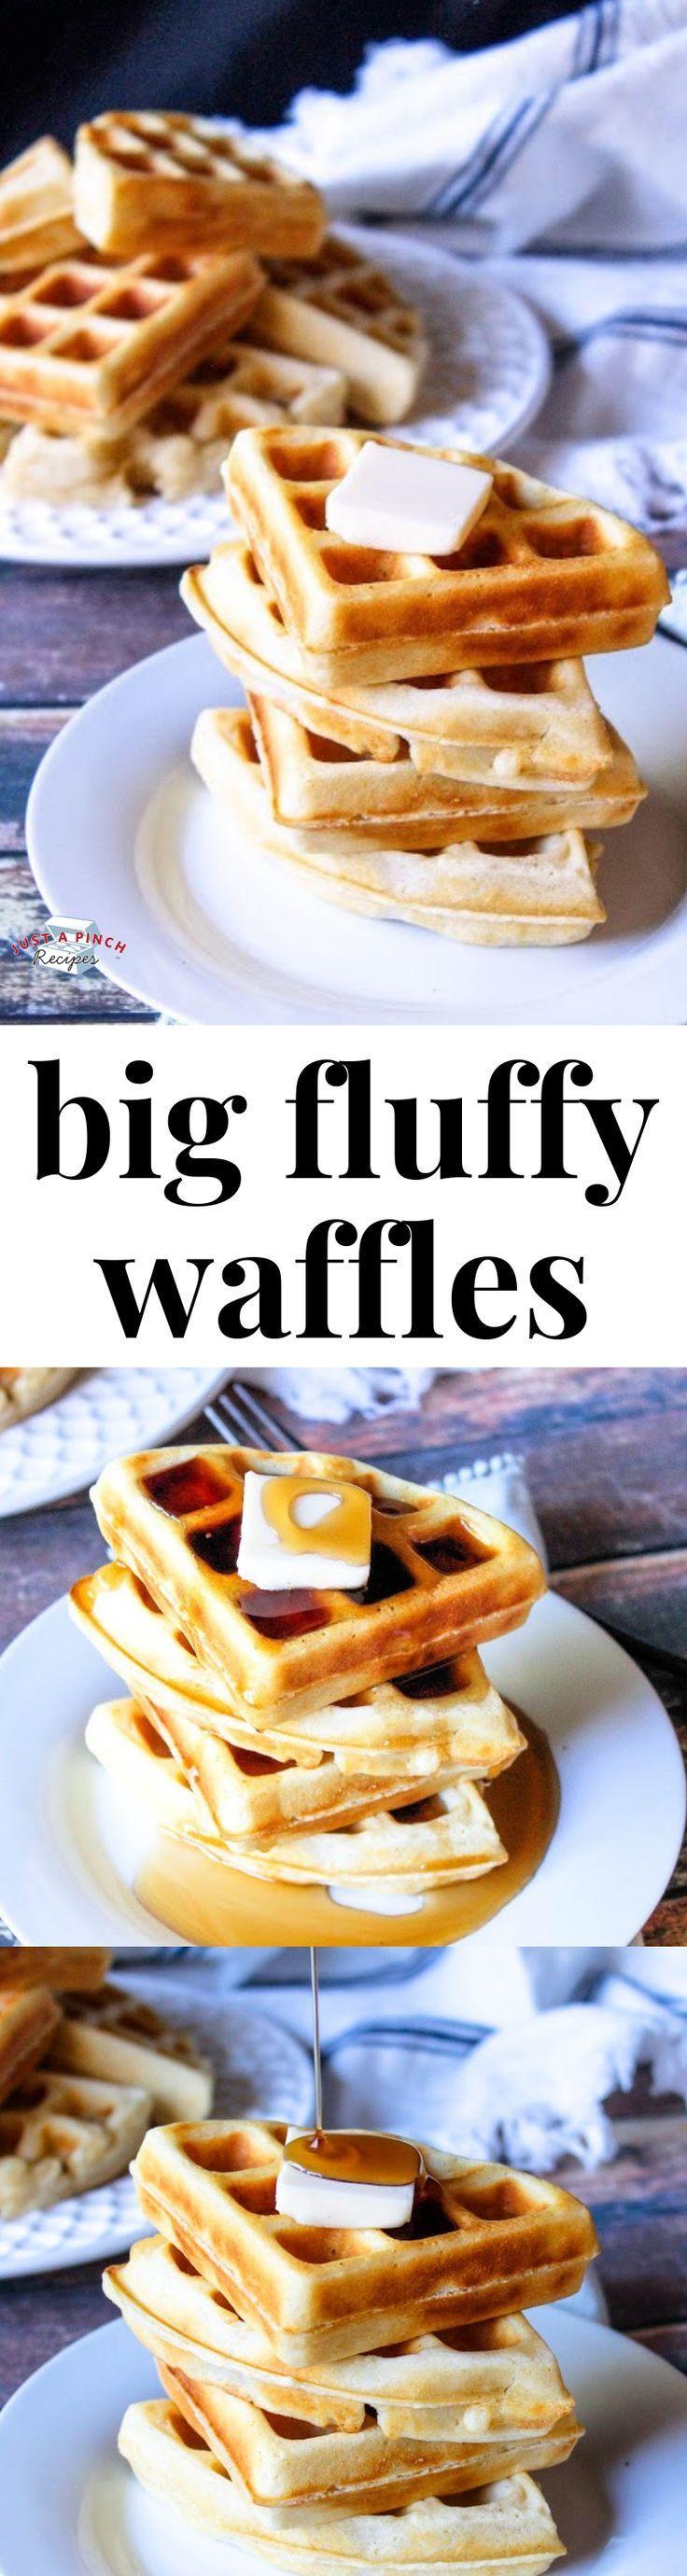 Big Fluffy Waffles Recipe Fluffy Waffles Homemade Waffles Waffles